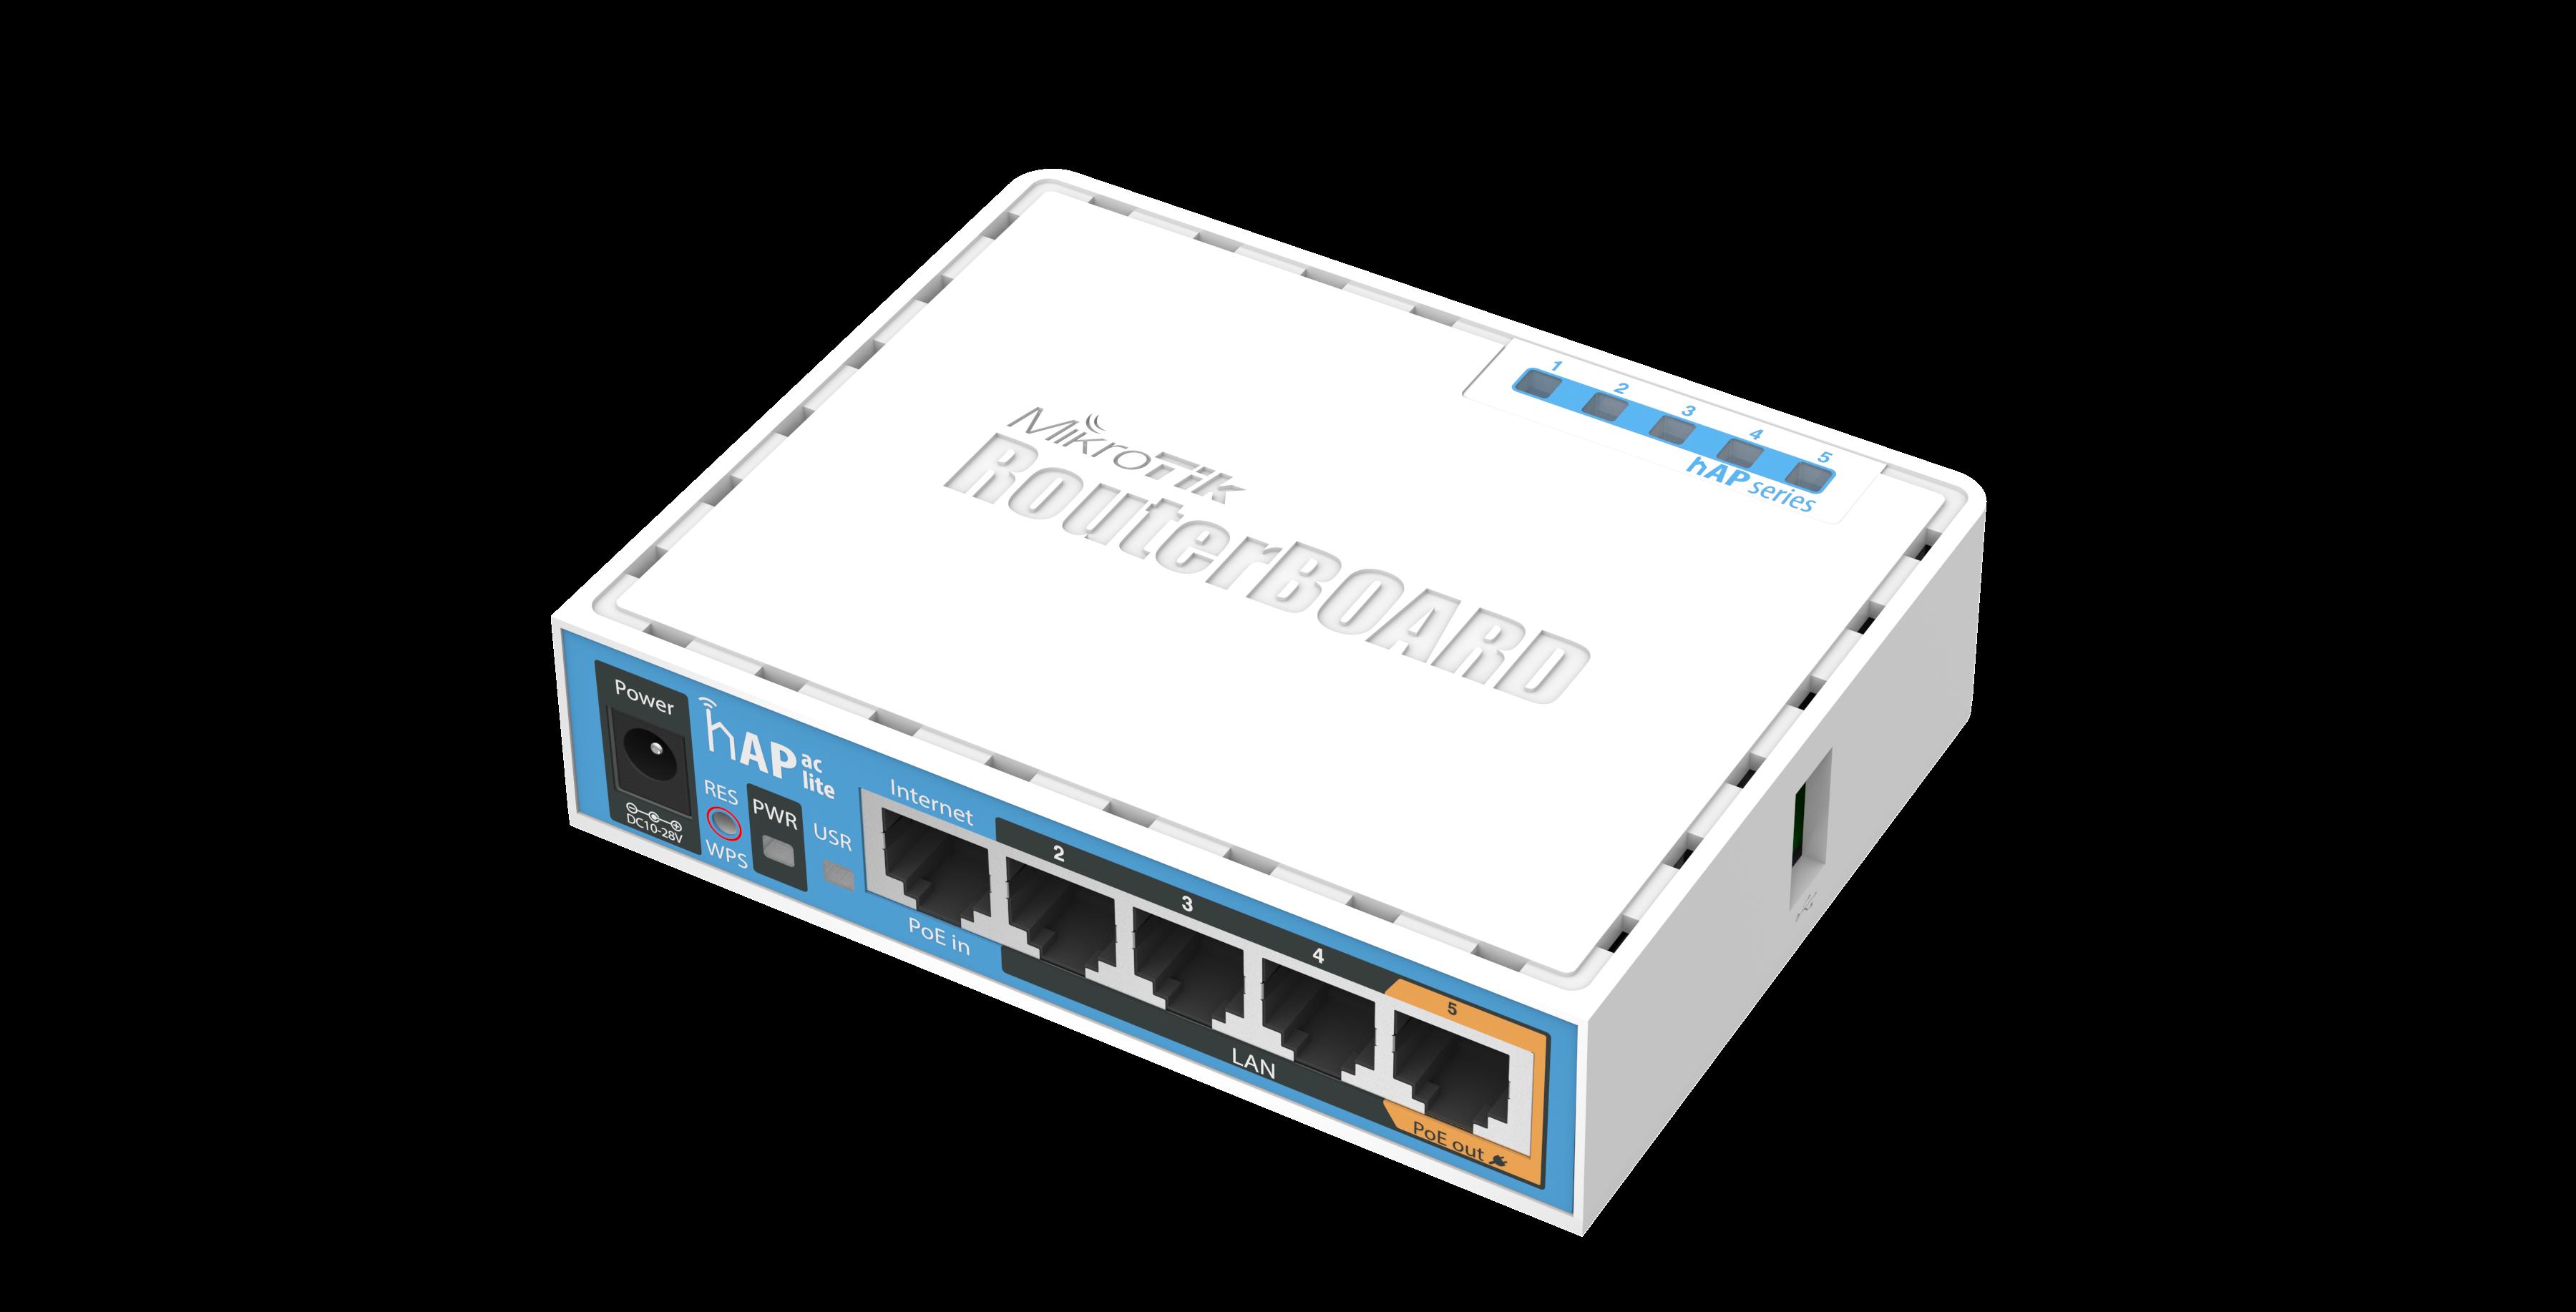 Mikrotik  hap AC lite (952Ui-2nD) Беспроводной маршрутизатор 2,4Ггц+5Ггц